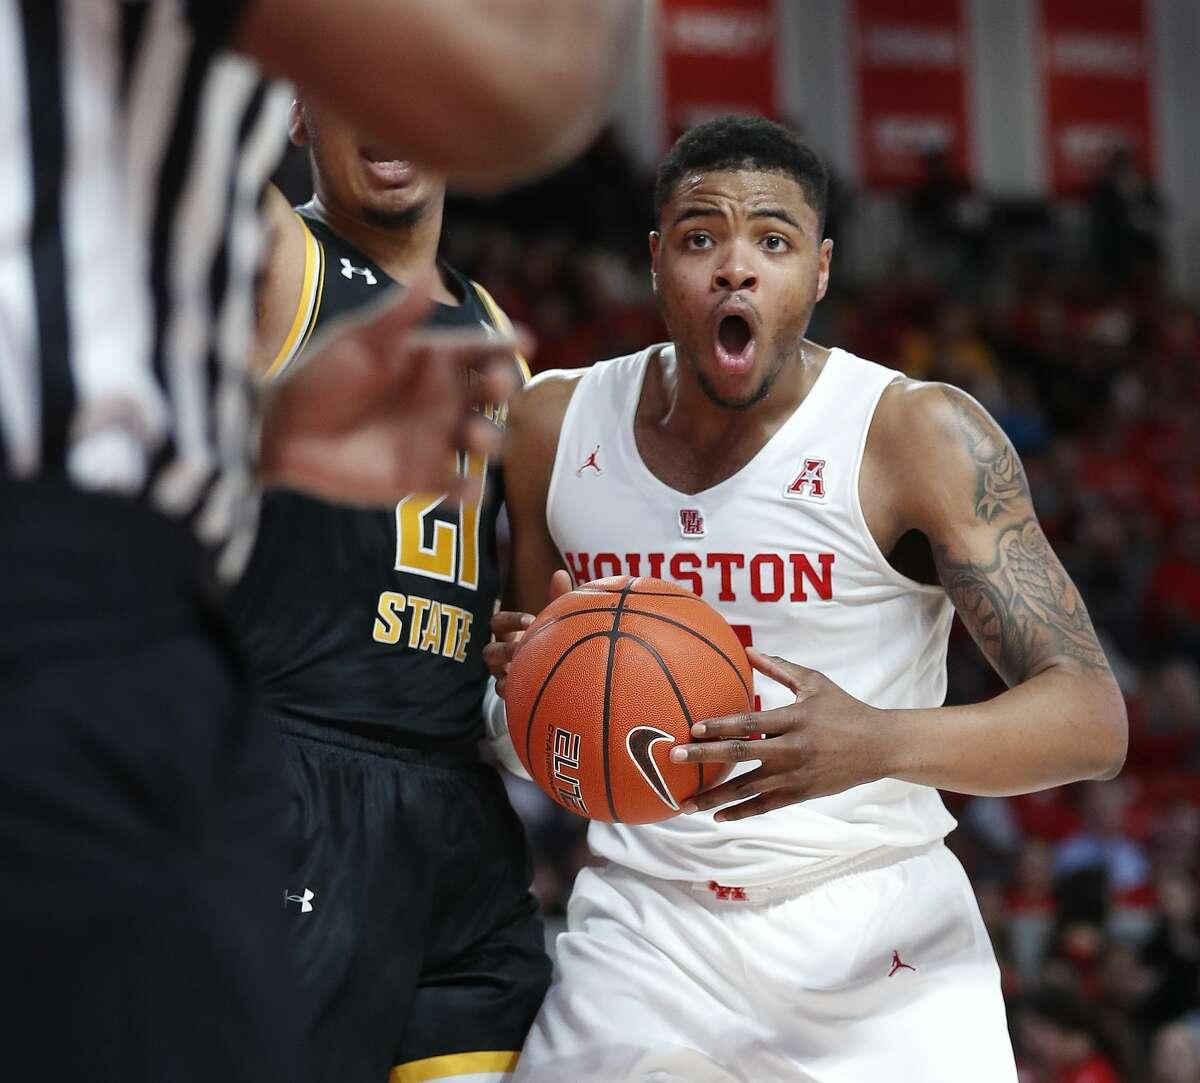 Breaon Brady Houston Cougars Basketball Jersey - Red